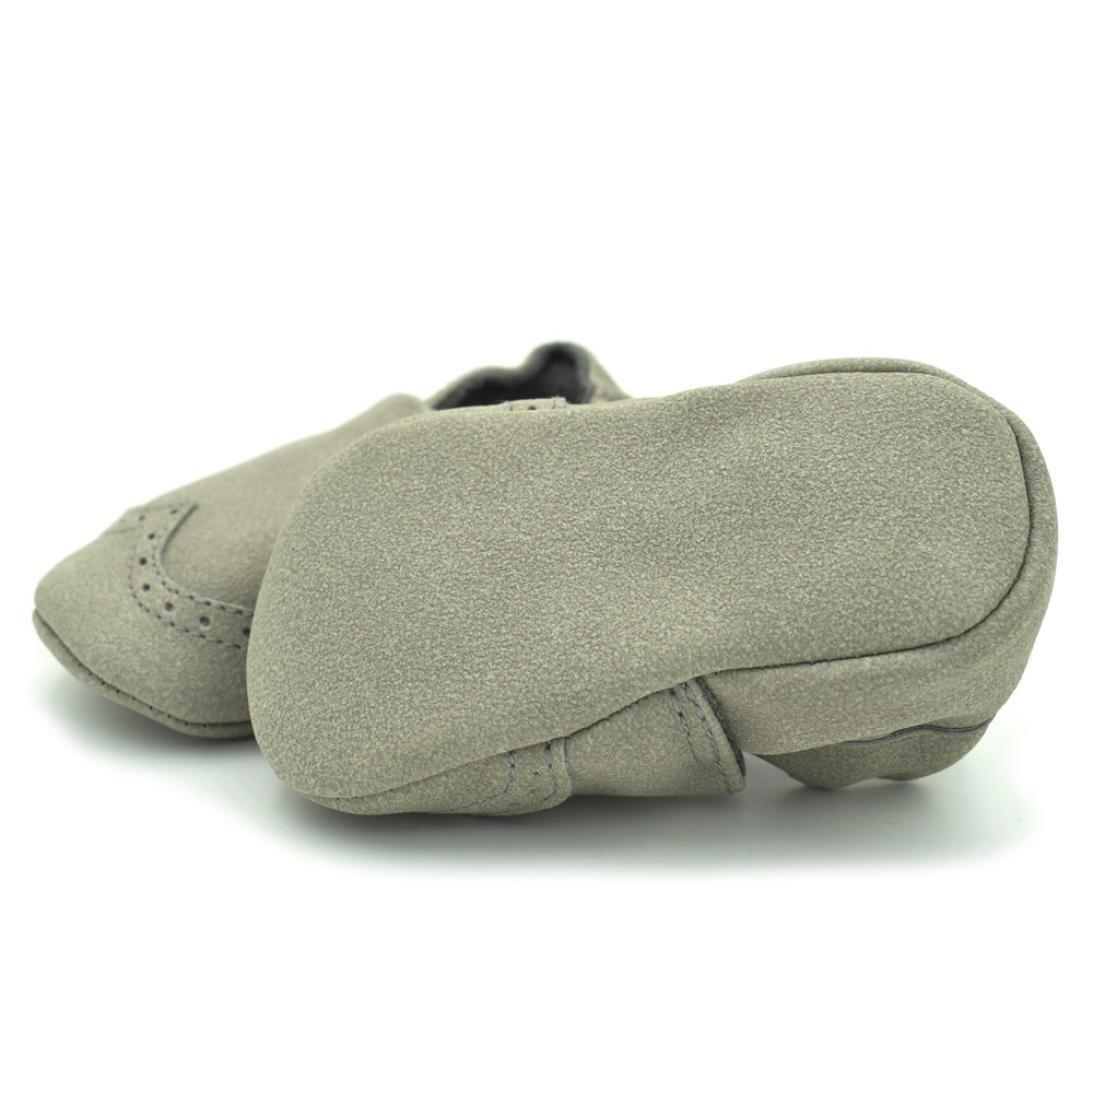 Lanhui Sunny Baby Boys Girls Newborn Shoes Soft Infants Soft Nubuck Shoes